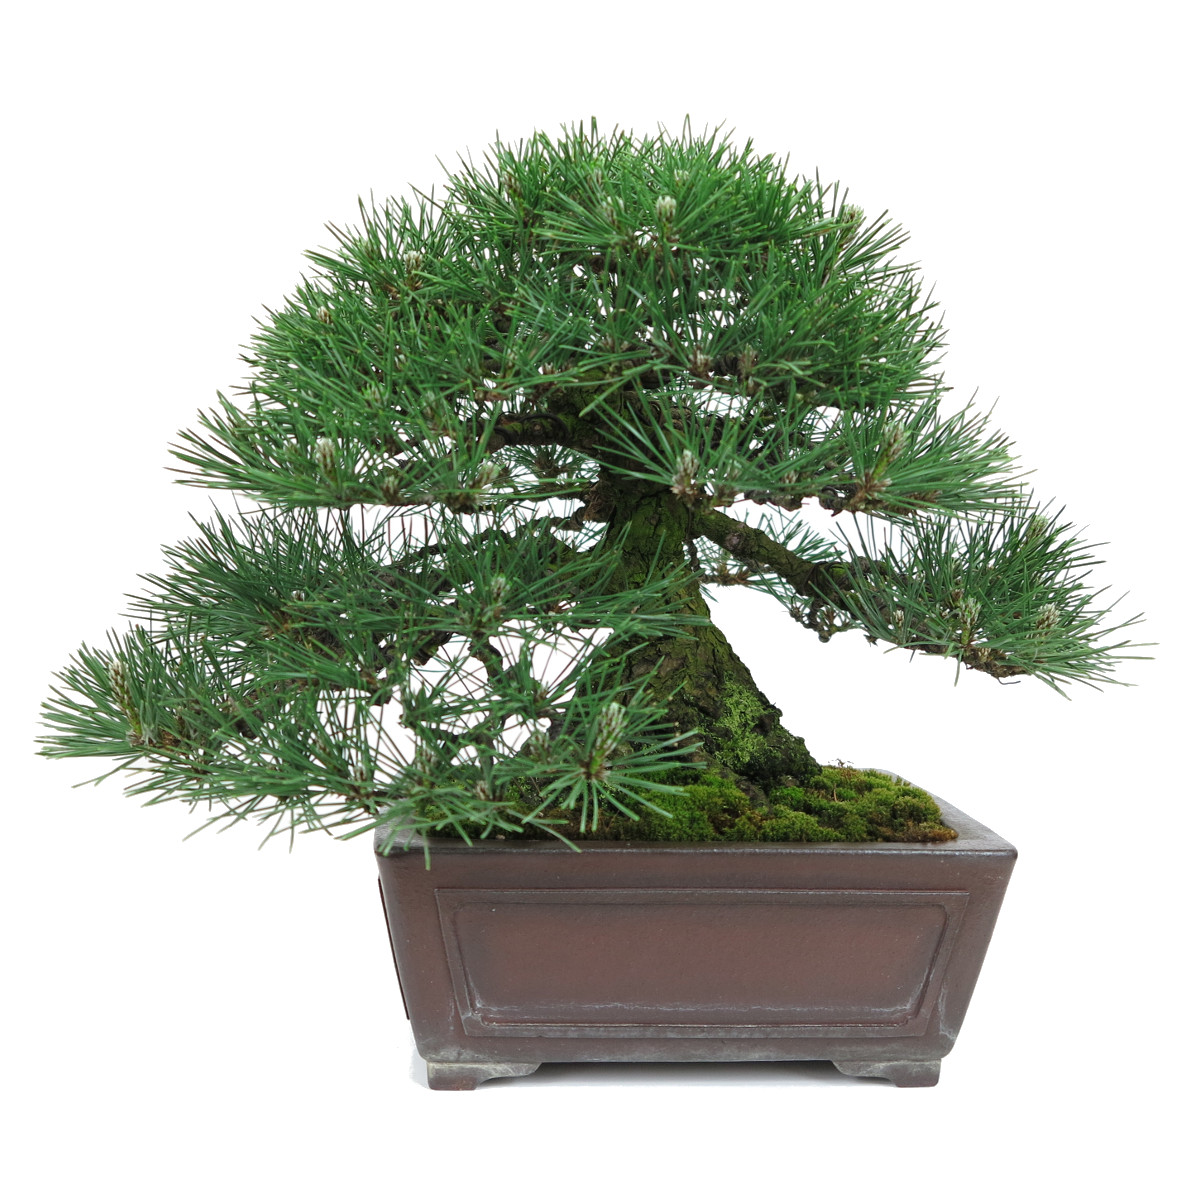 http://bonsai-shohin.com/wp-content/uploads/2017/05/pin-noir-shohin.jpg